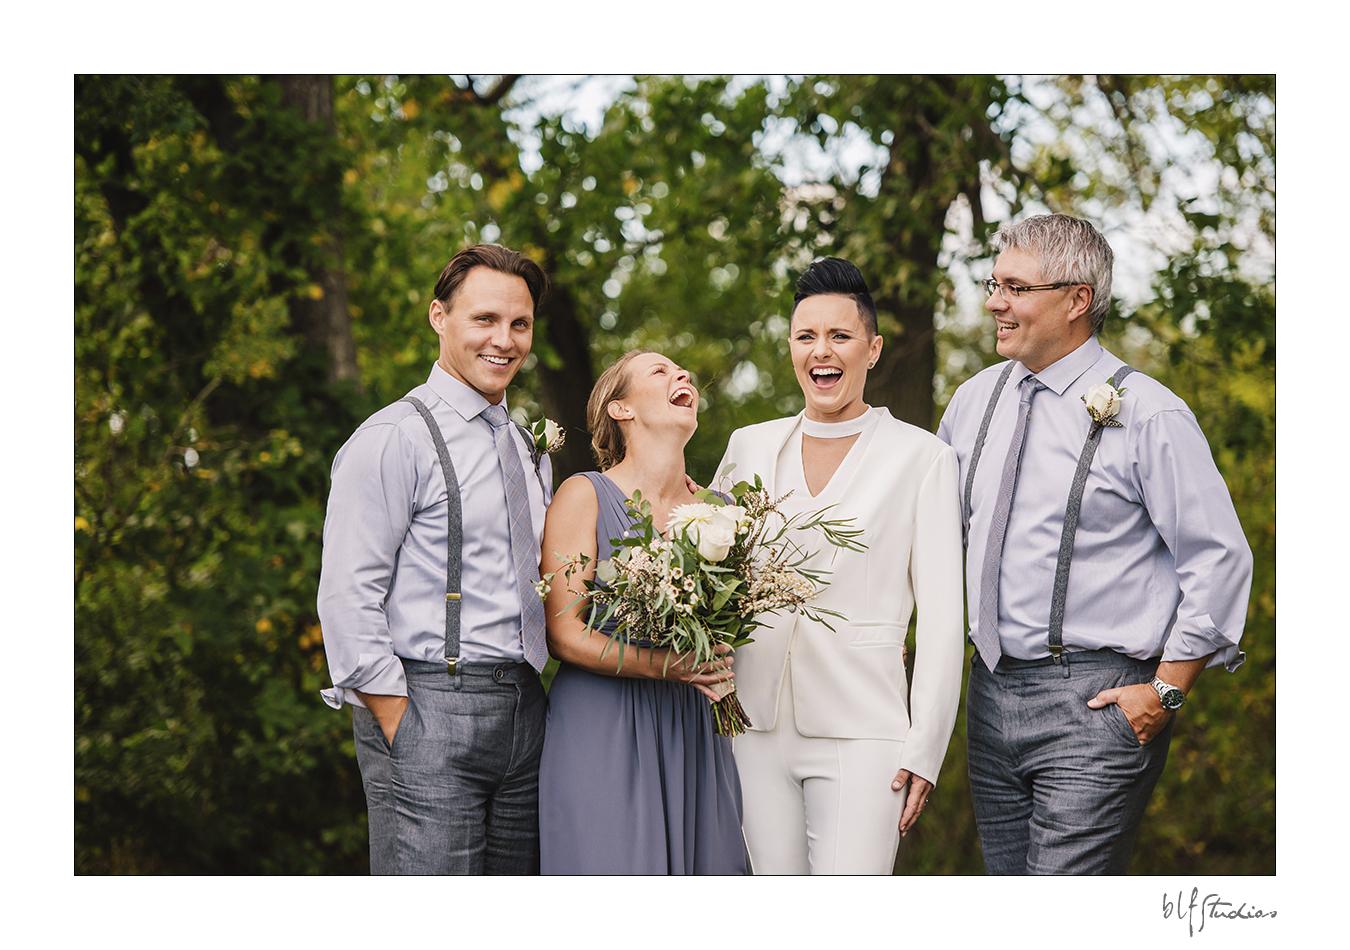 019-winnipeg-hitchnpost-wedding-marla-alana.jpg